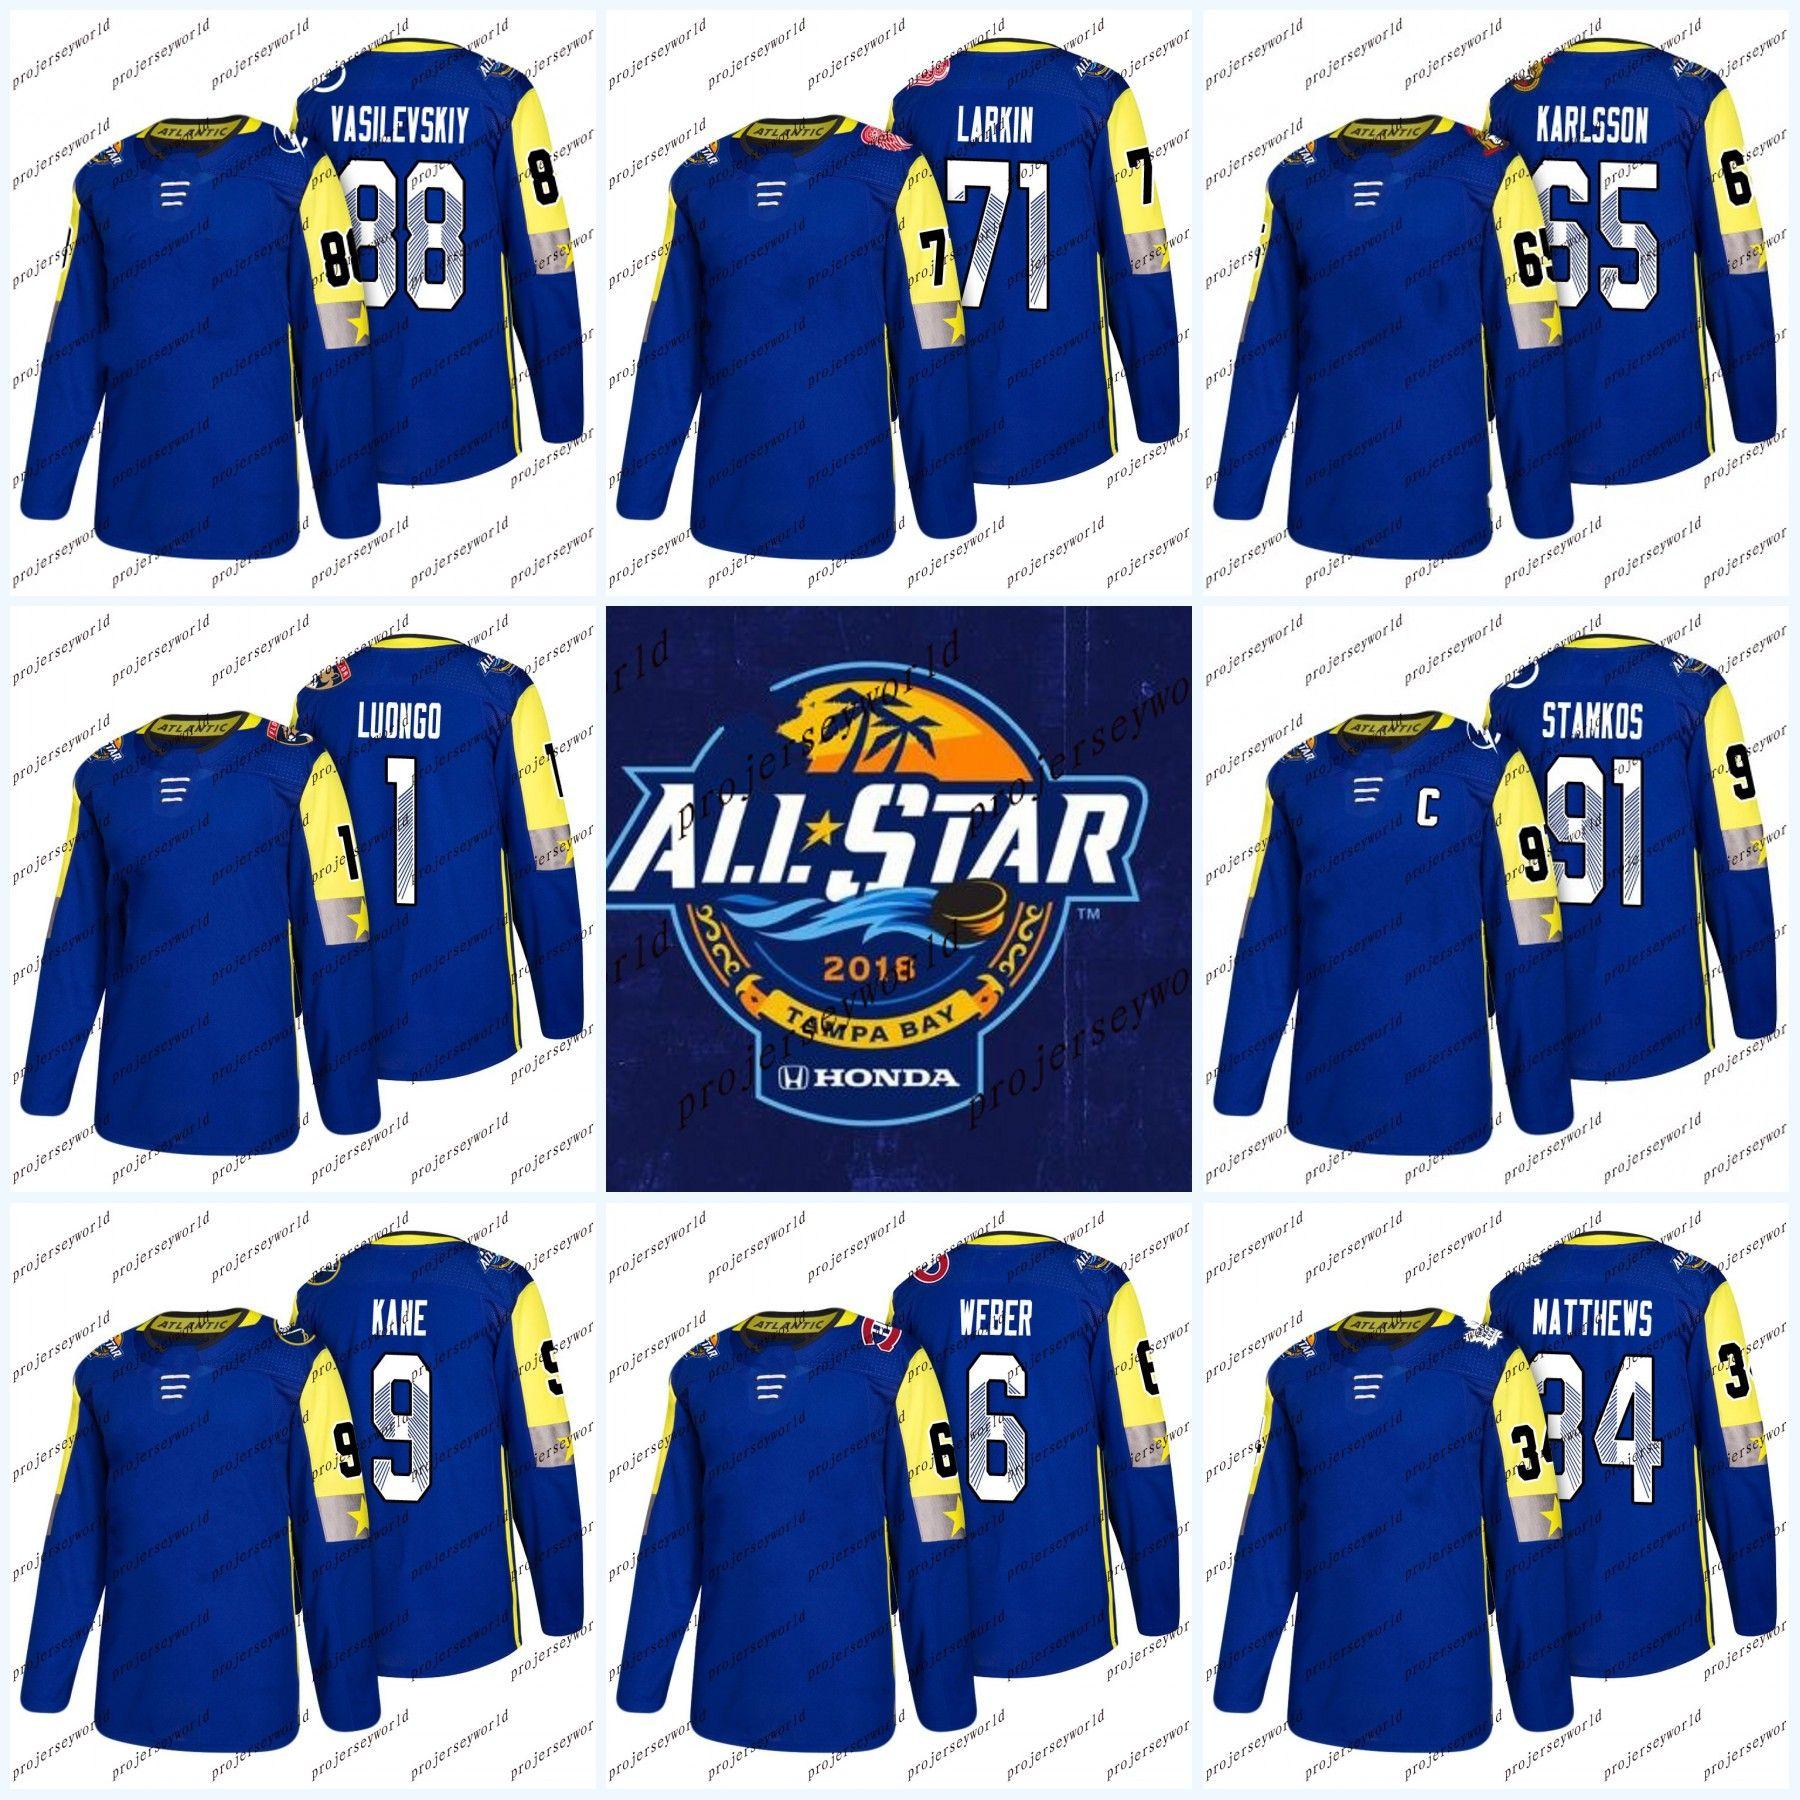 save off c1f6f 9be31 Matthews All Auston 2019 Star Jersey lockup.paganellisport.com